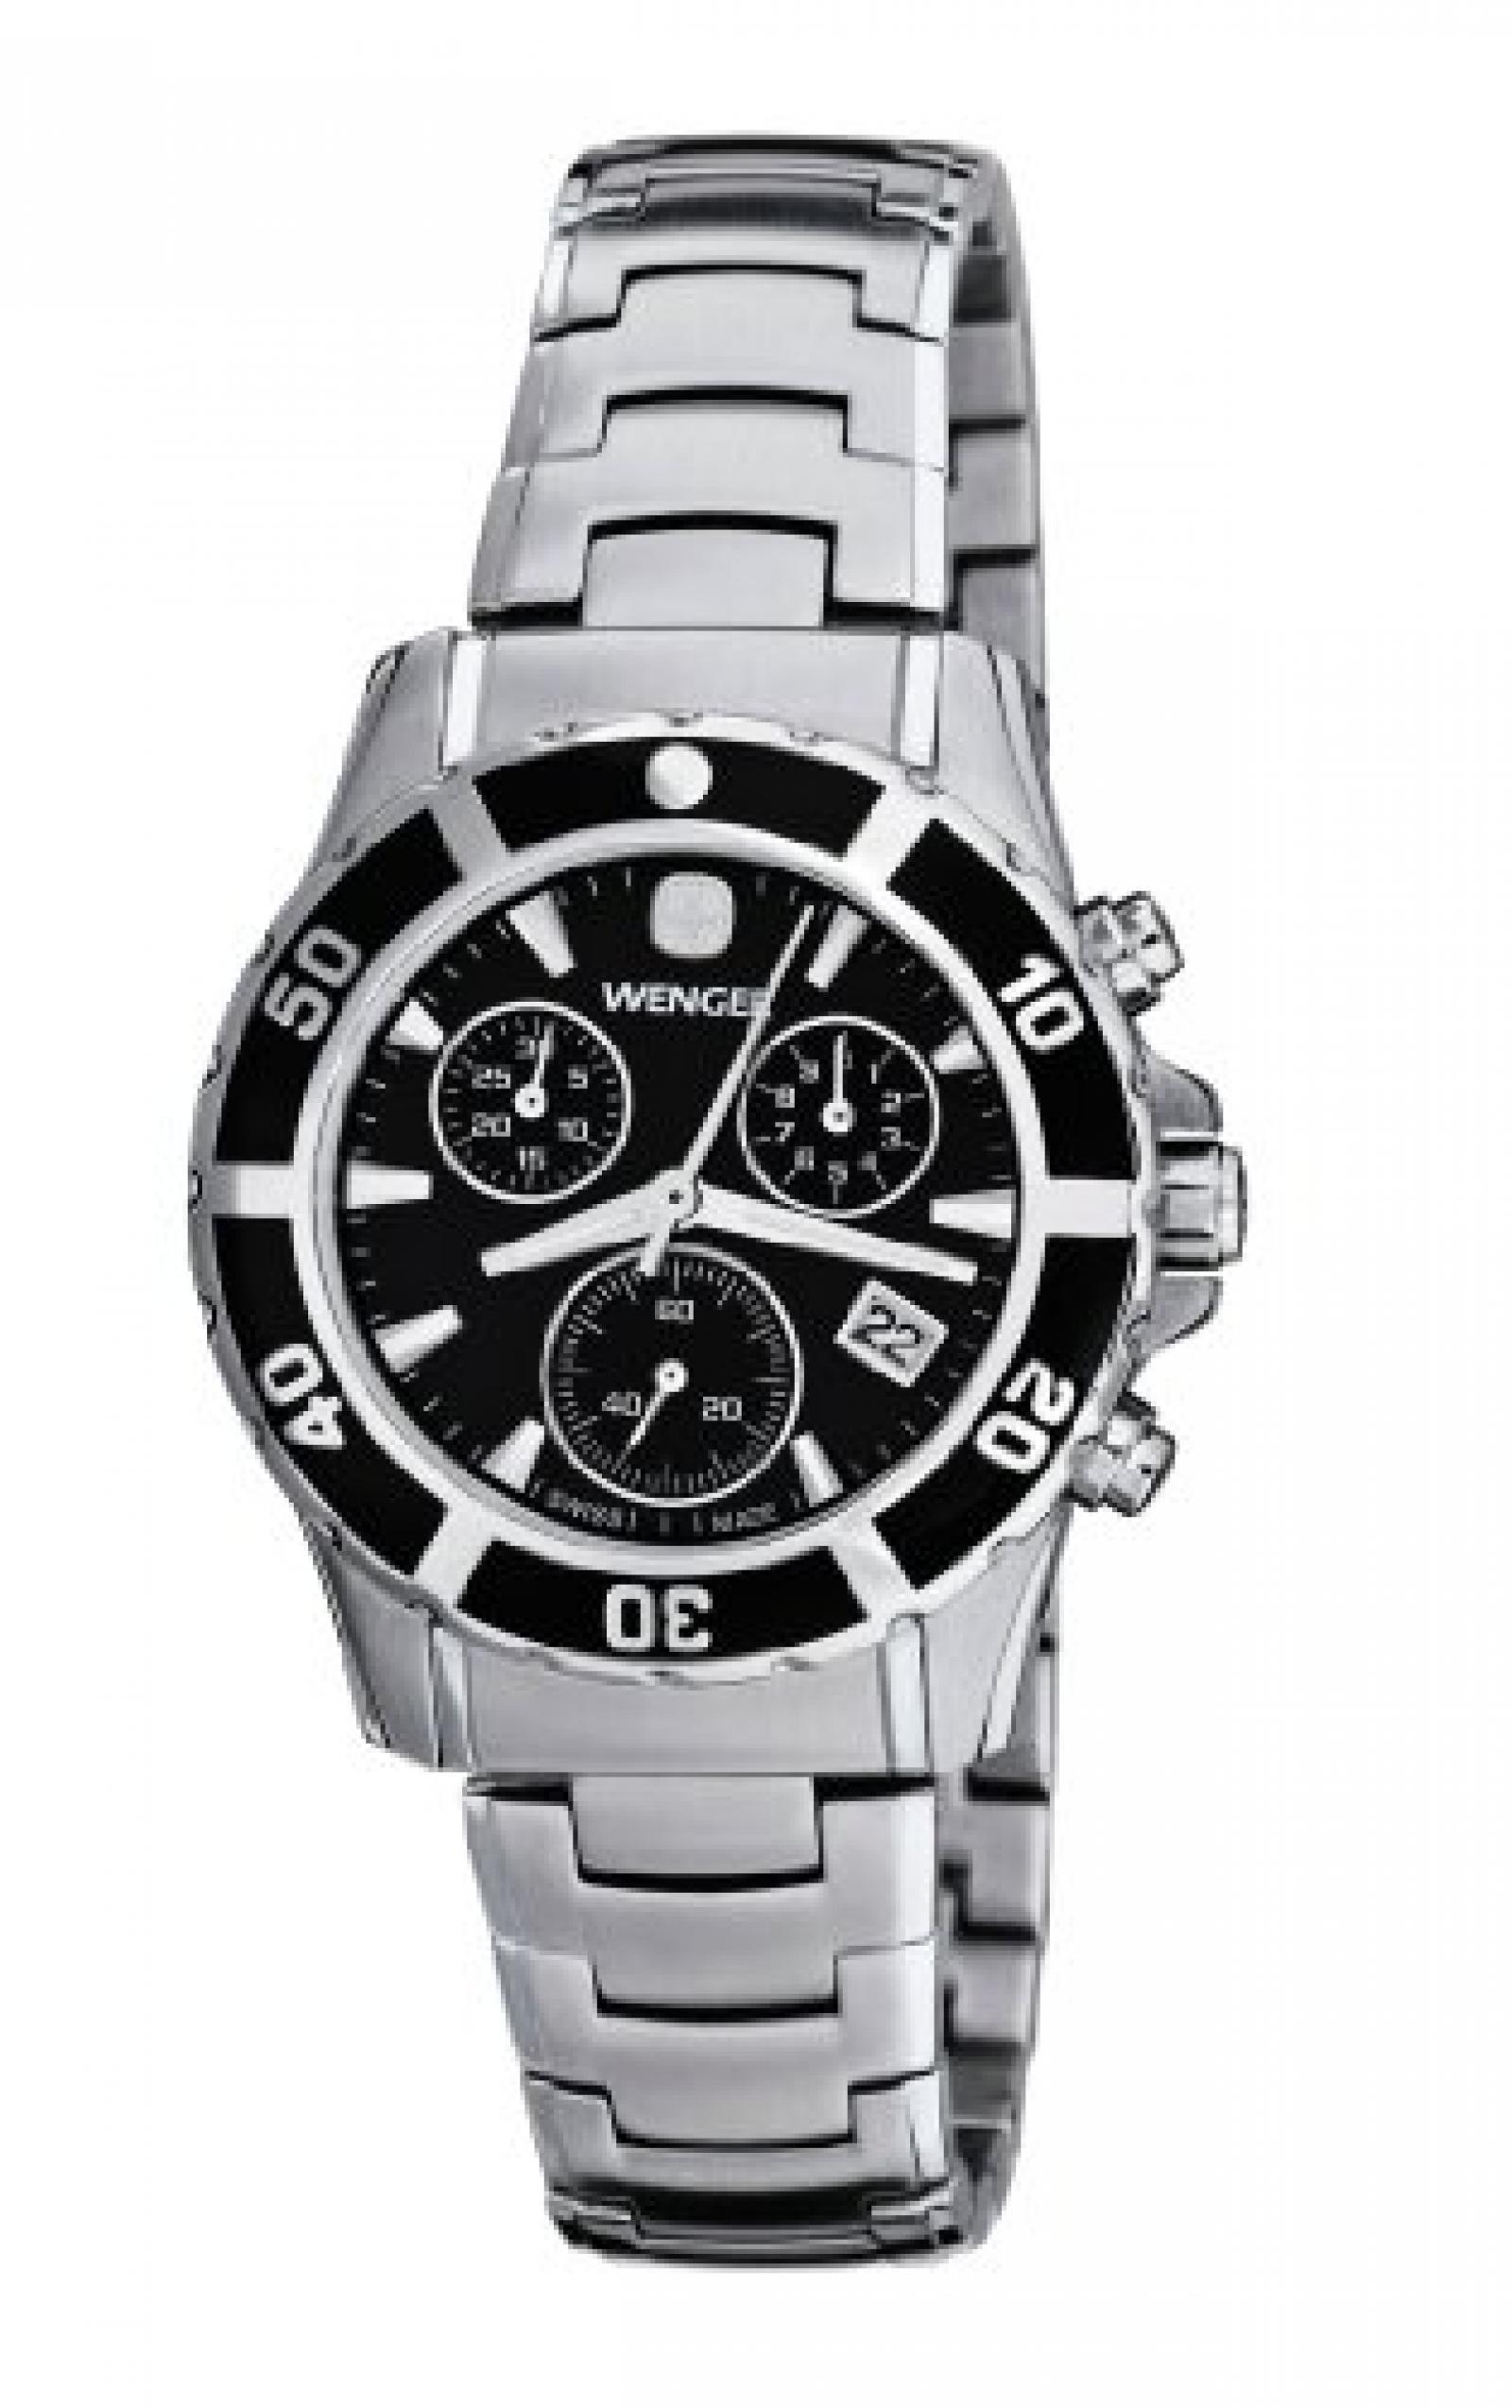 Damen Uhren WENGER SPORT Elegance 70746